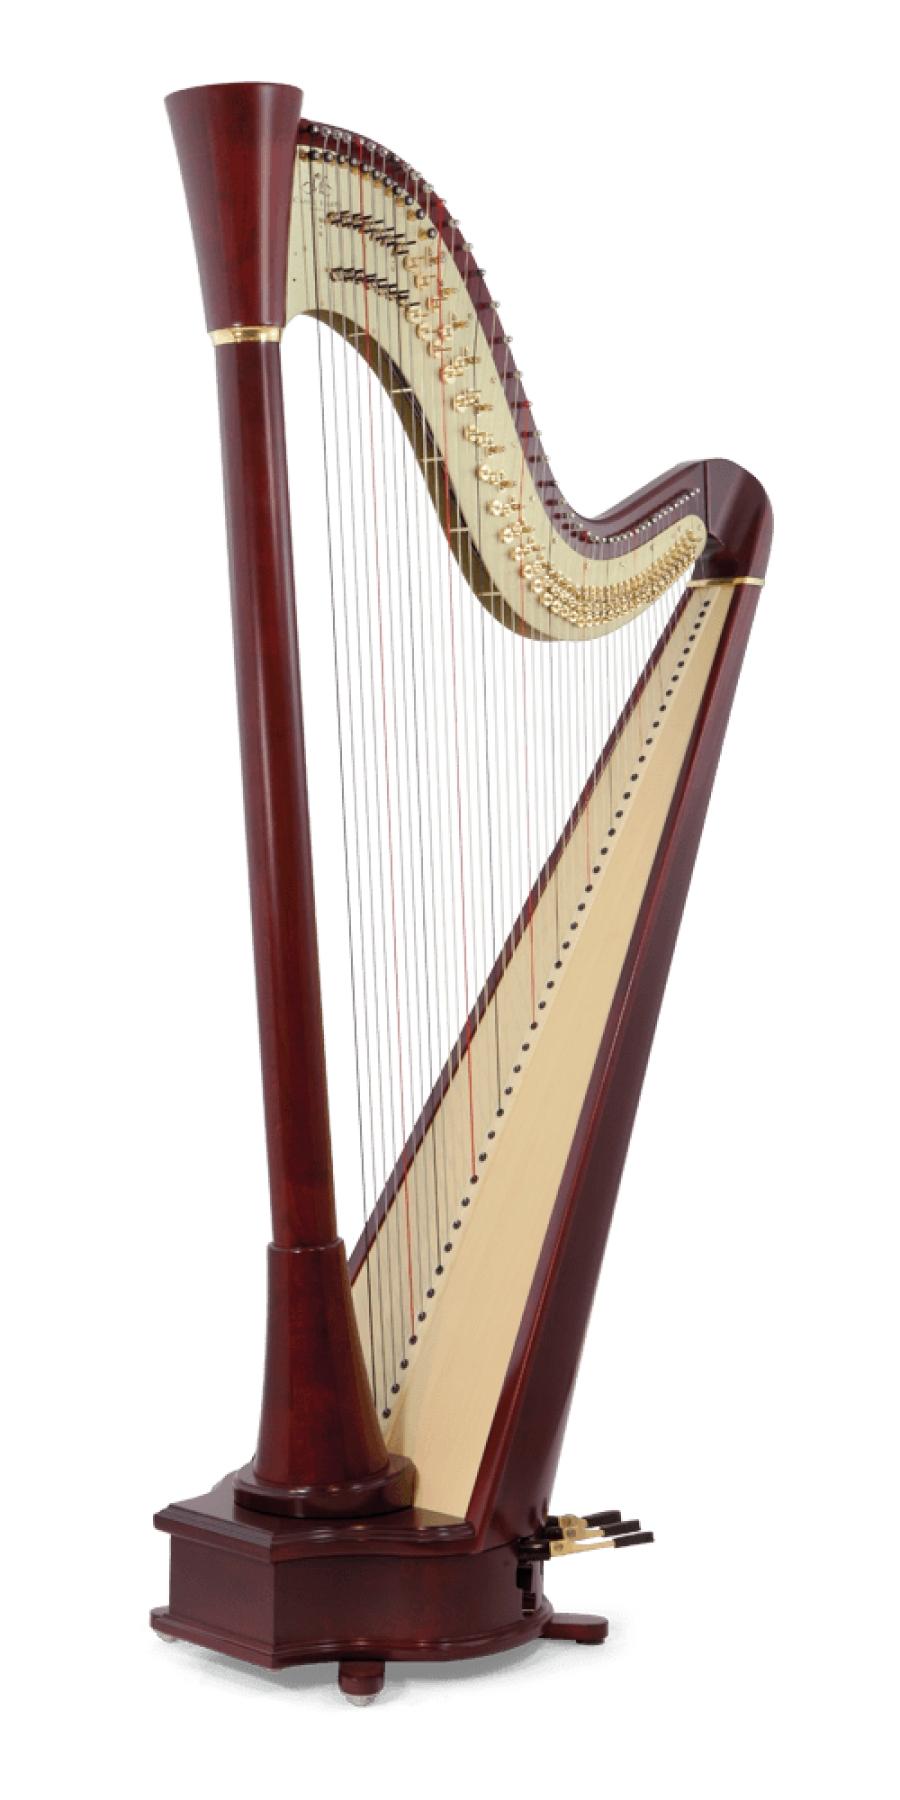 Camac Clio Straight Pacific Atlantic Harps